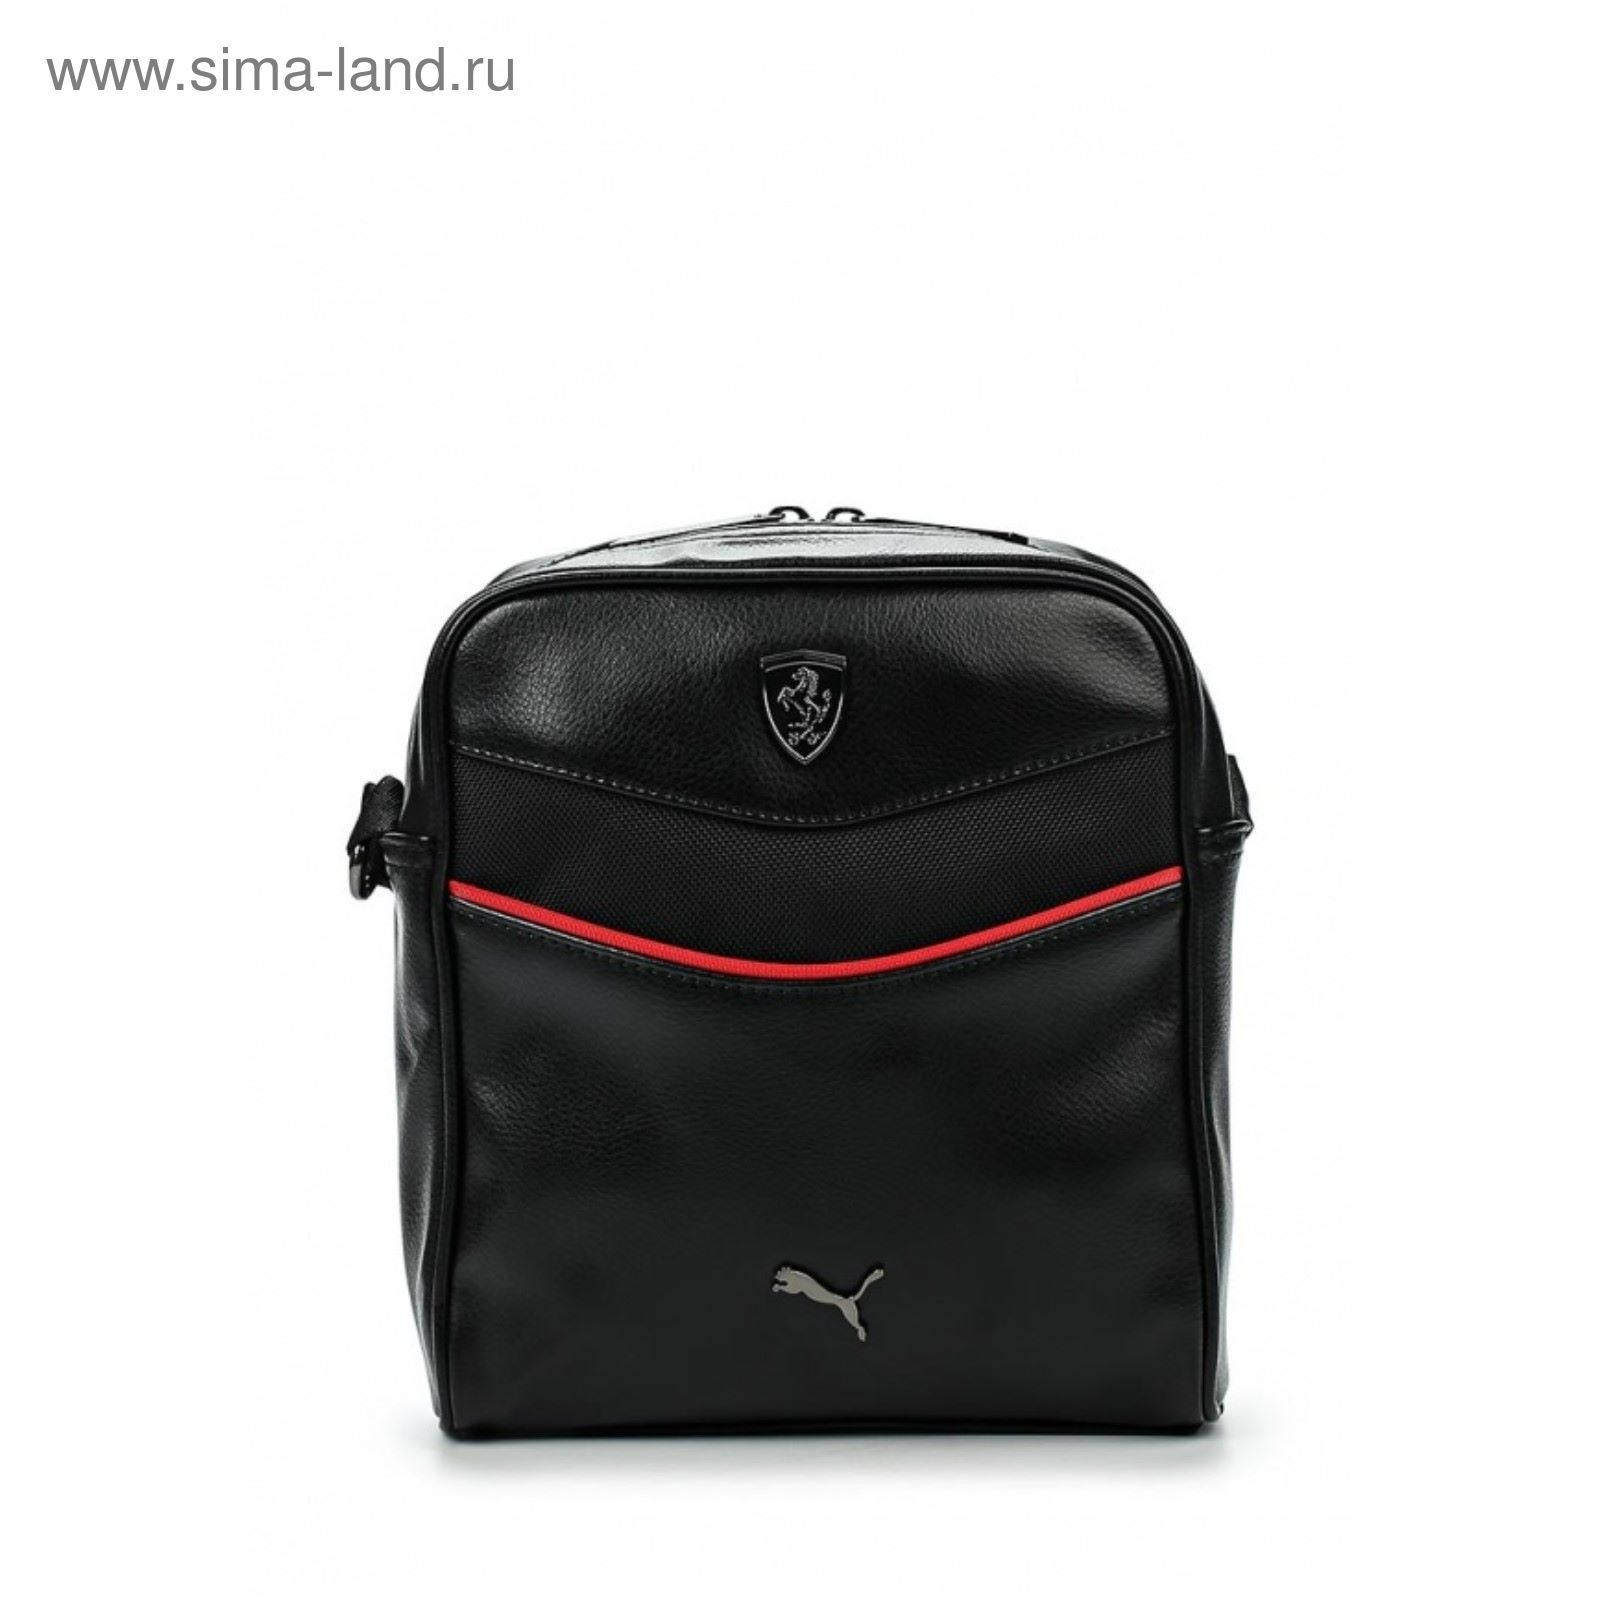 2bf245d1 Сумка унисекс PUMA Ferrari LS Portable 7394101 (2350315) - Купить по ...